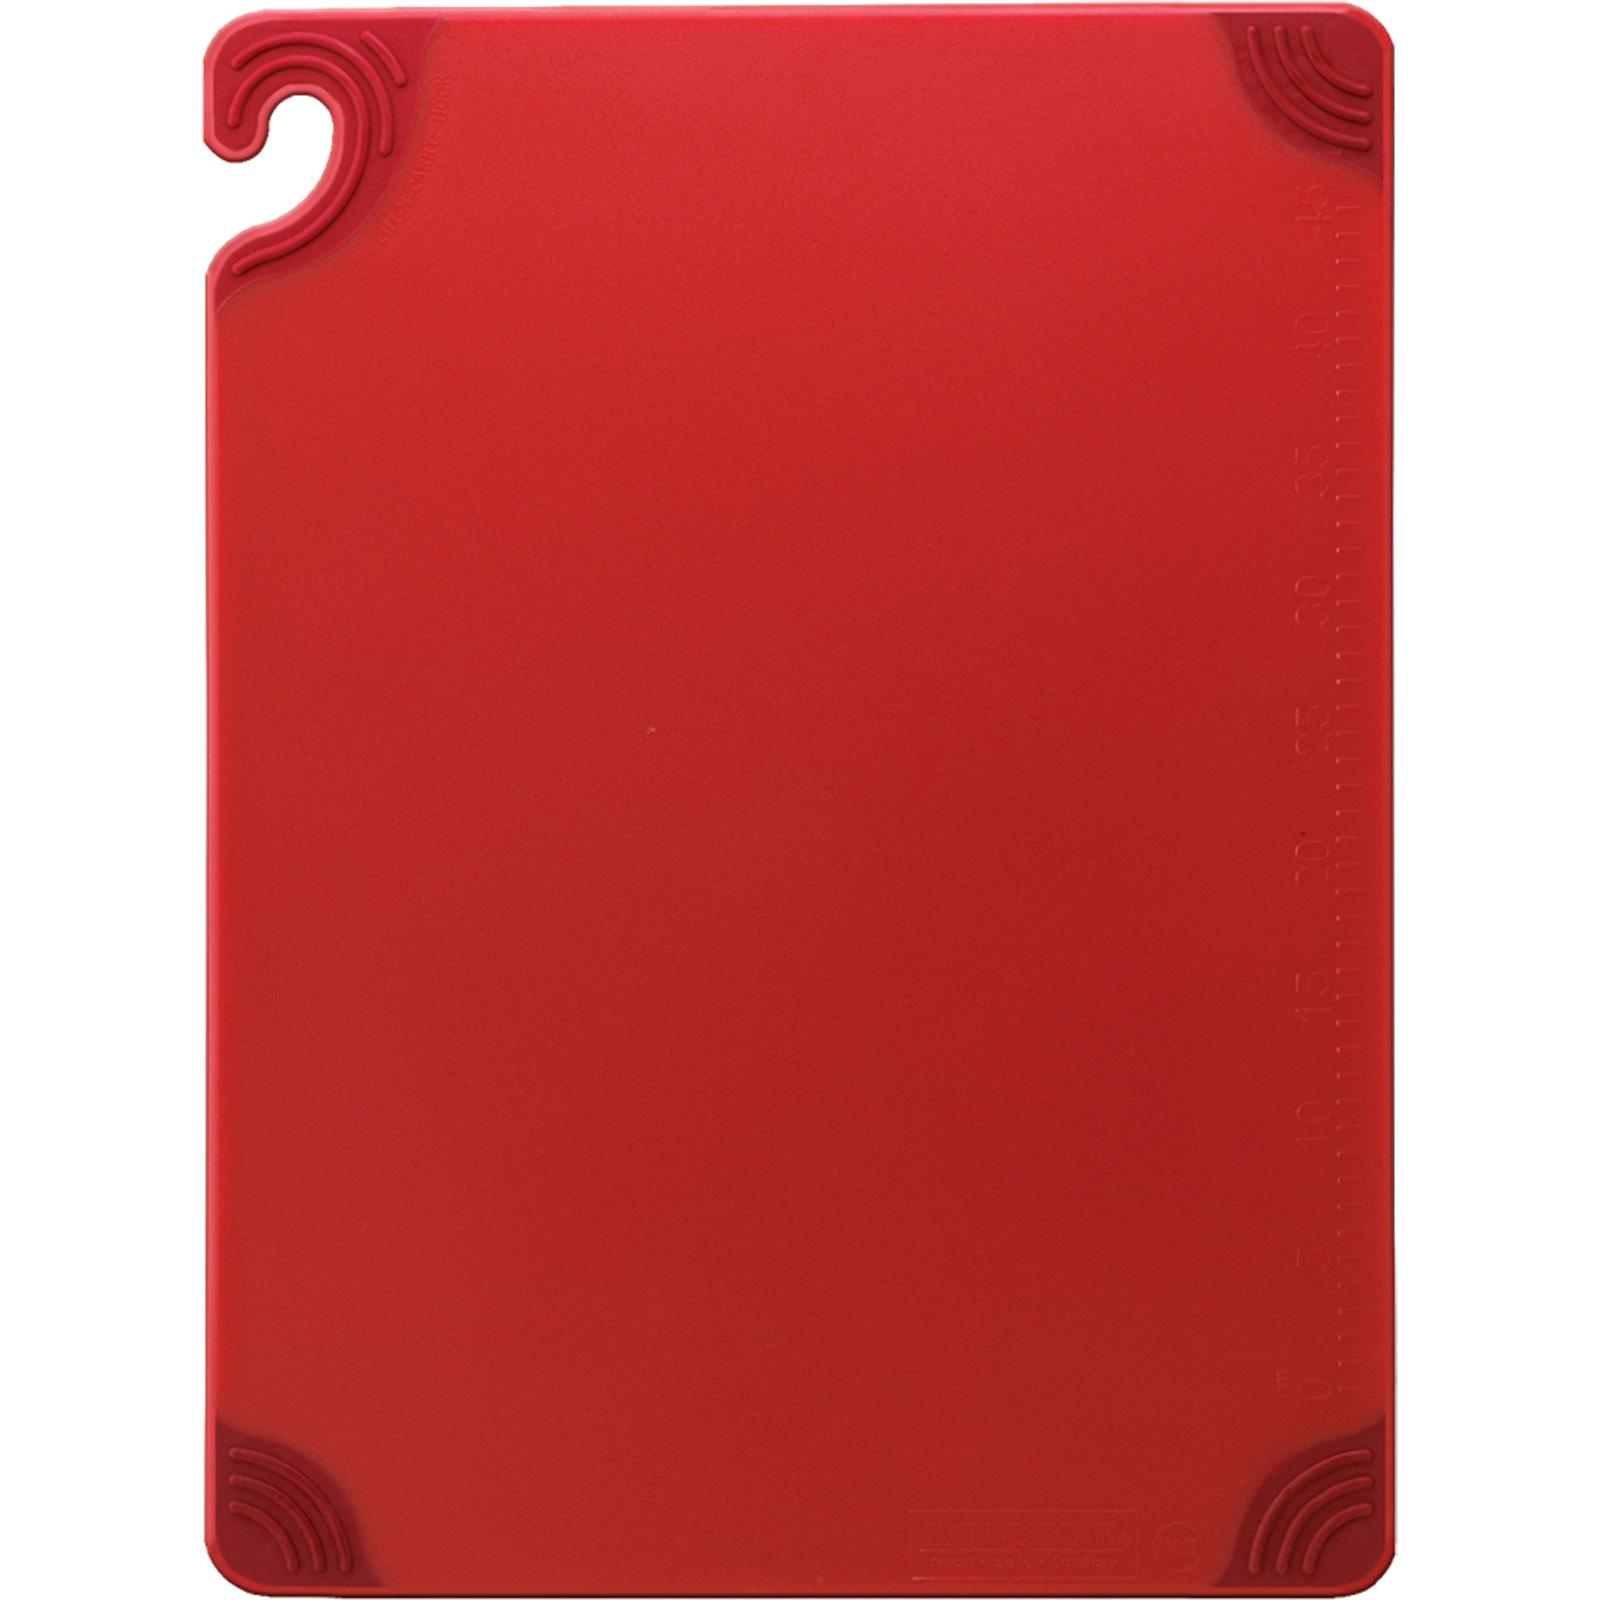 San Jamar CBG912RD cutting board, plastic